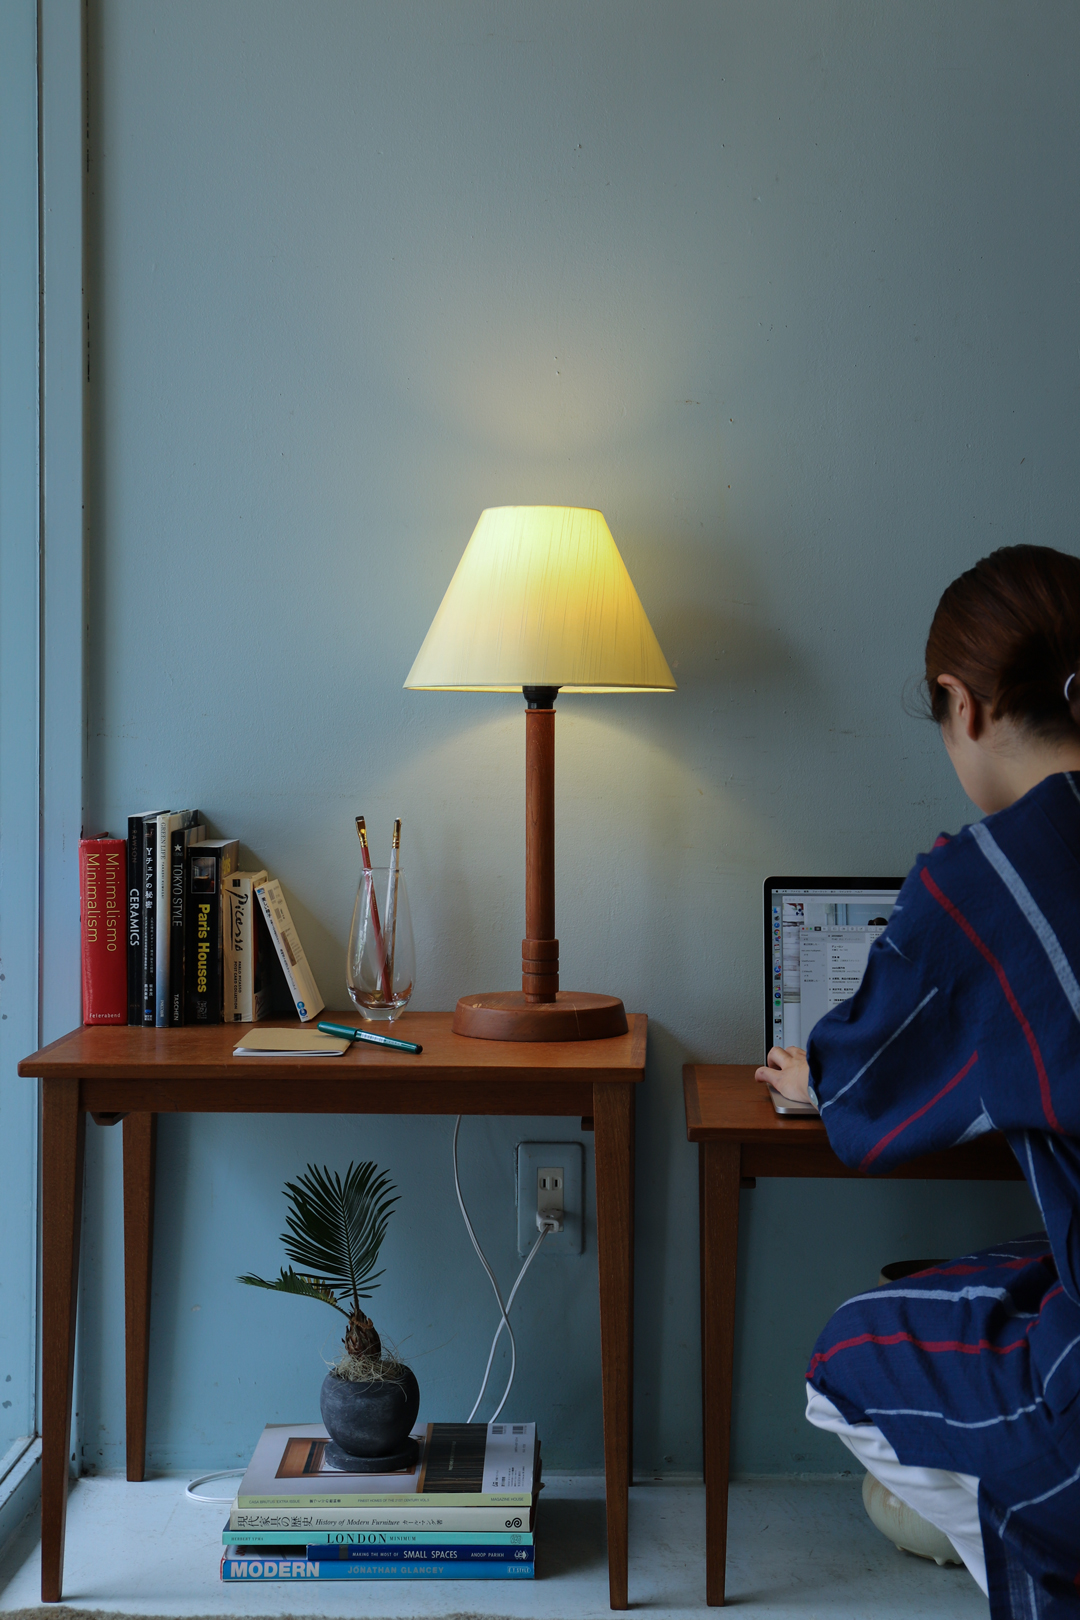 Japanese Vintage Table Stand Lamp/ジャパンヴィンテージ テーブルスタンド ランプ 間接照明 チーク材 インテリア